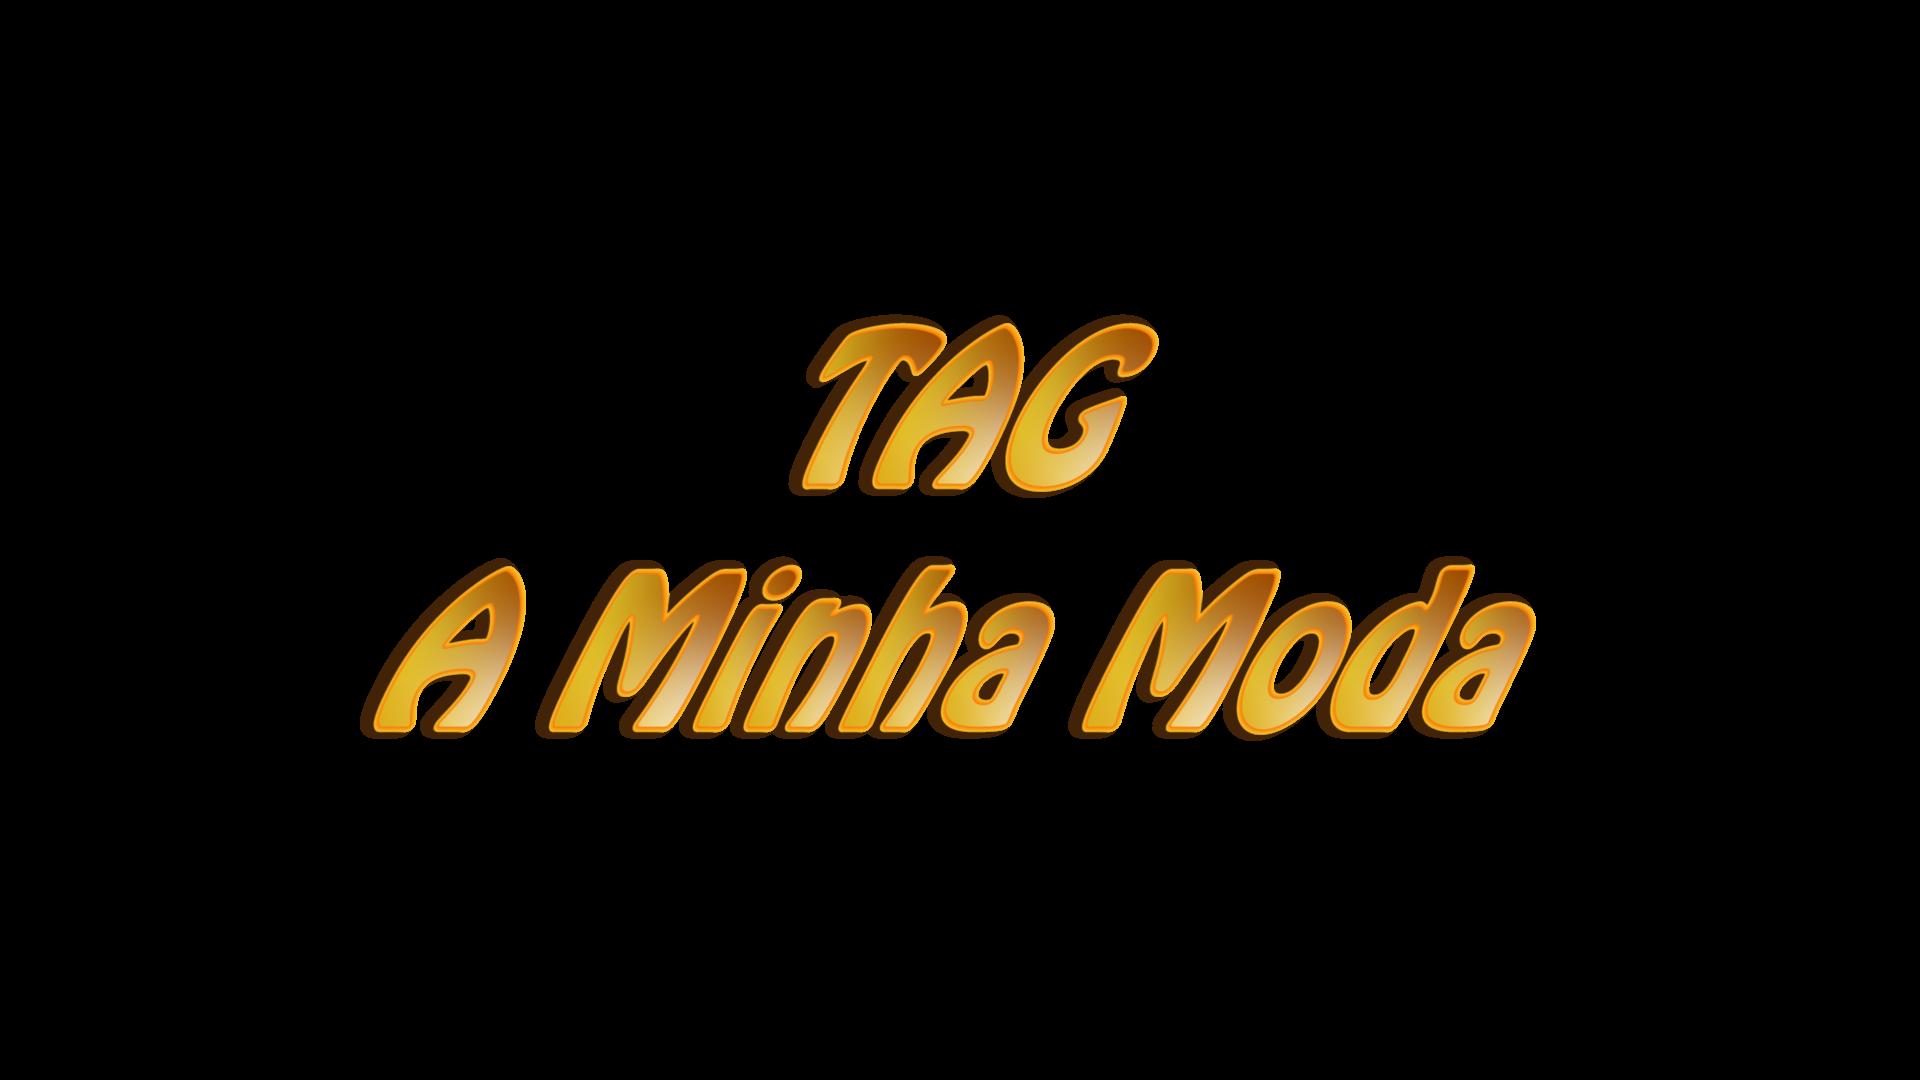 TAG: A Minha Moda